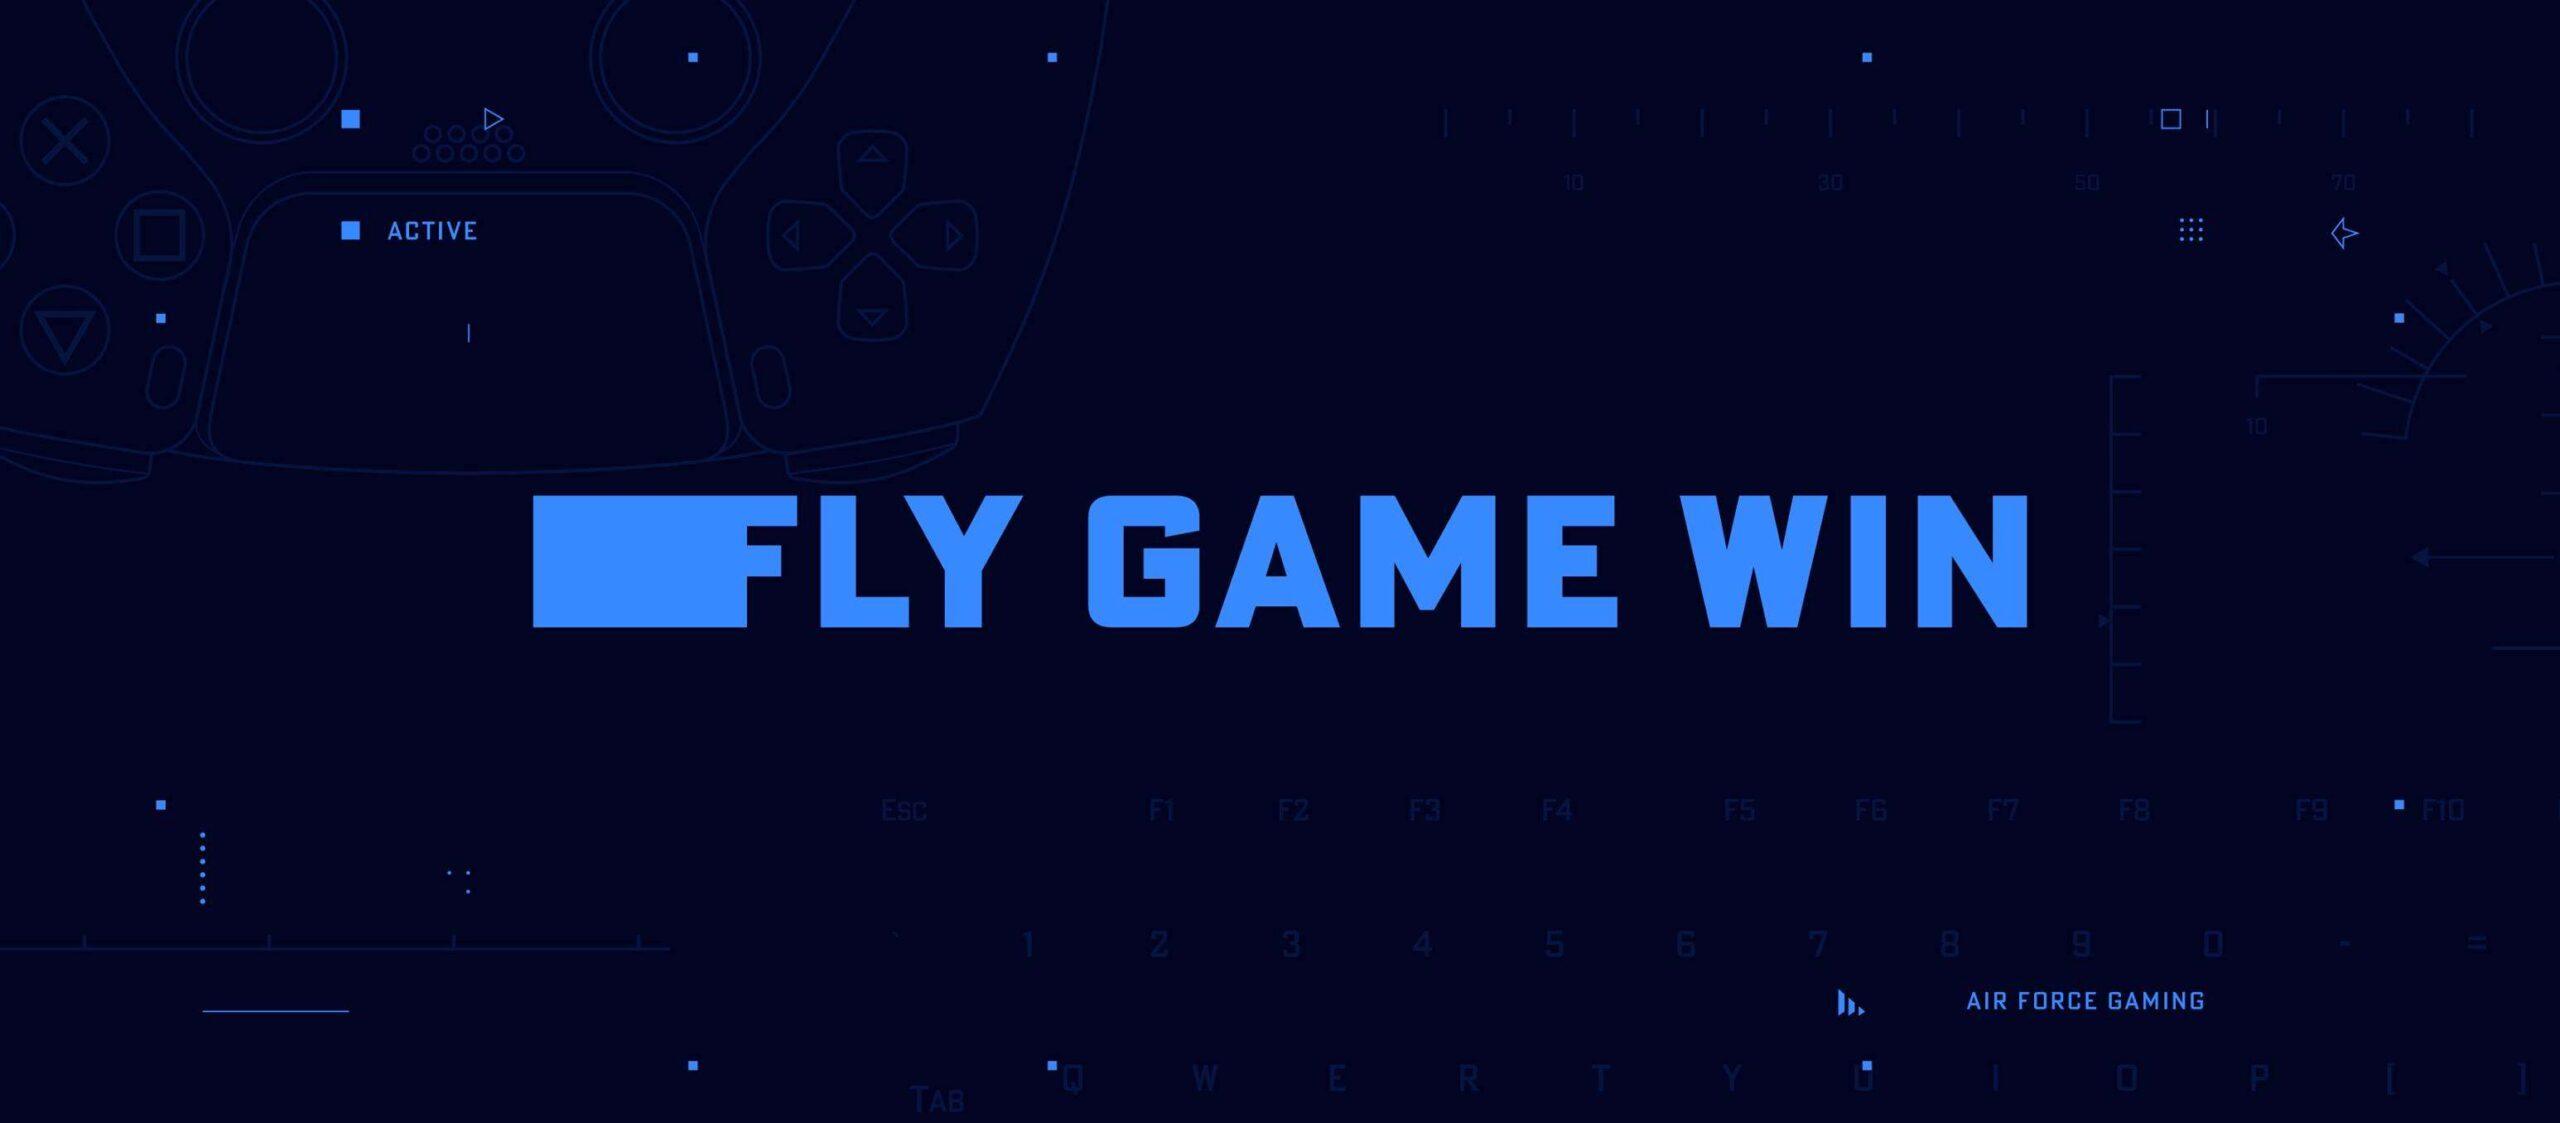 Esports Gaming Platform for Air Force Gaming